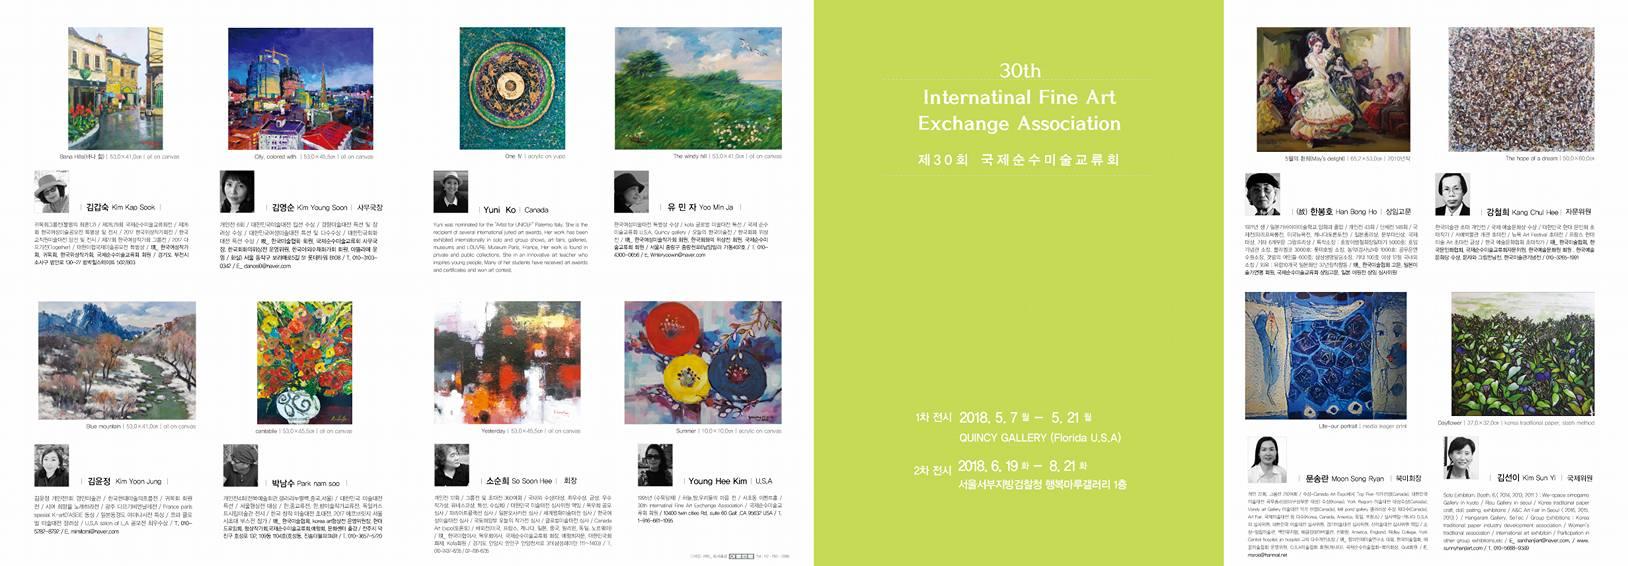 catalogue 1.jpg